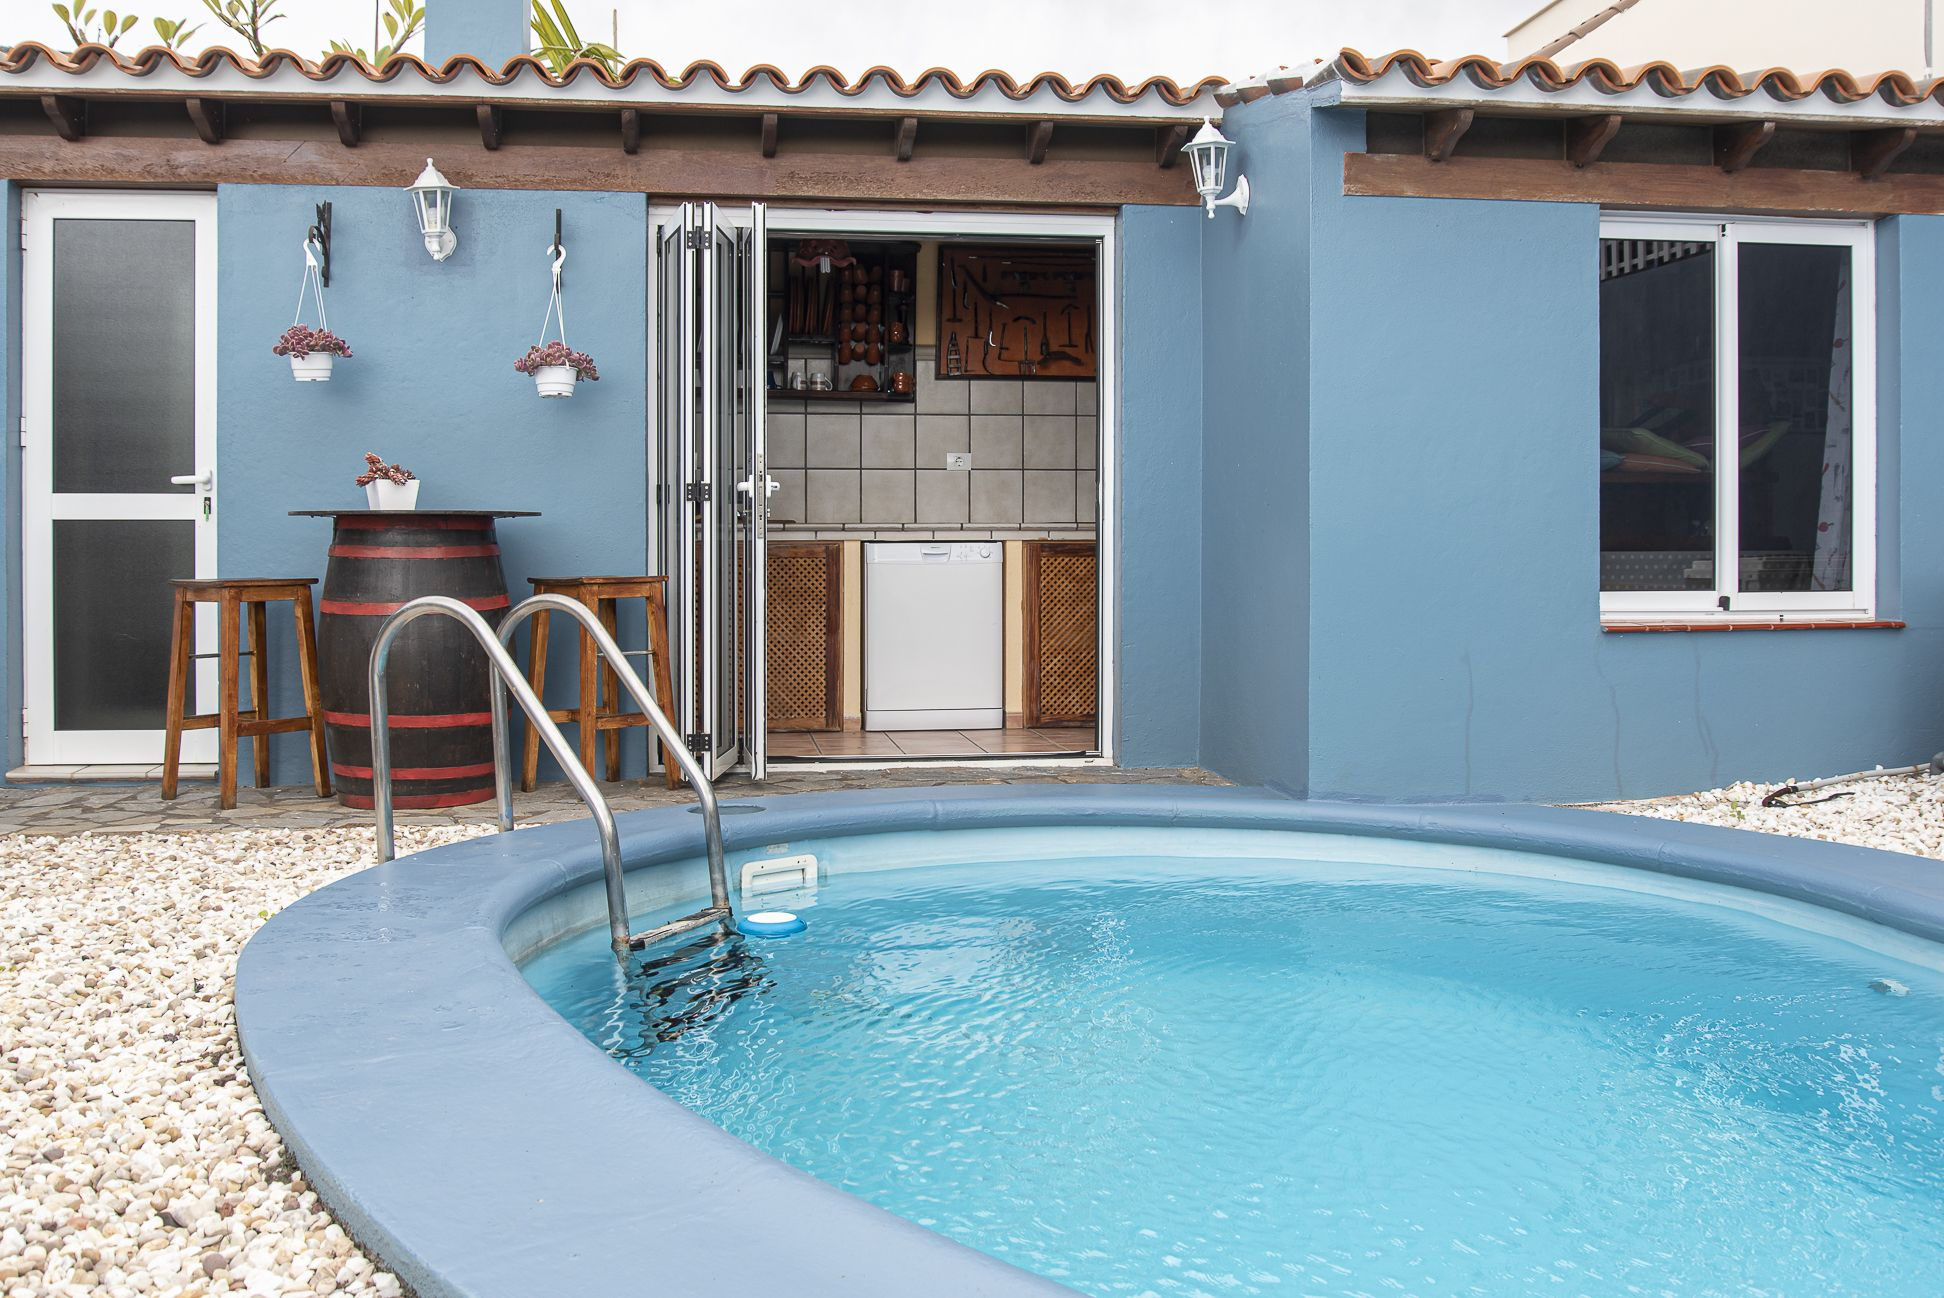 La Casa Azul - Tegueste. Zona de barbacoa